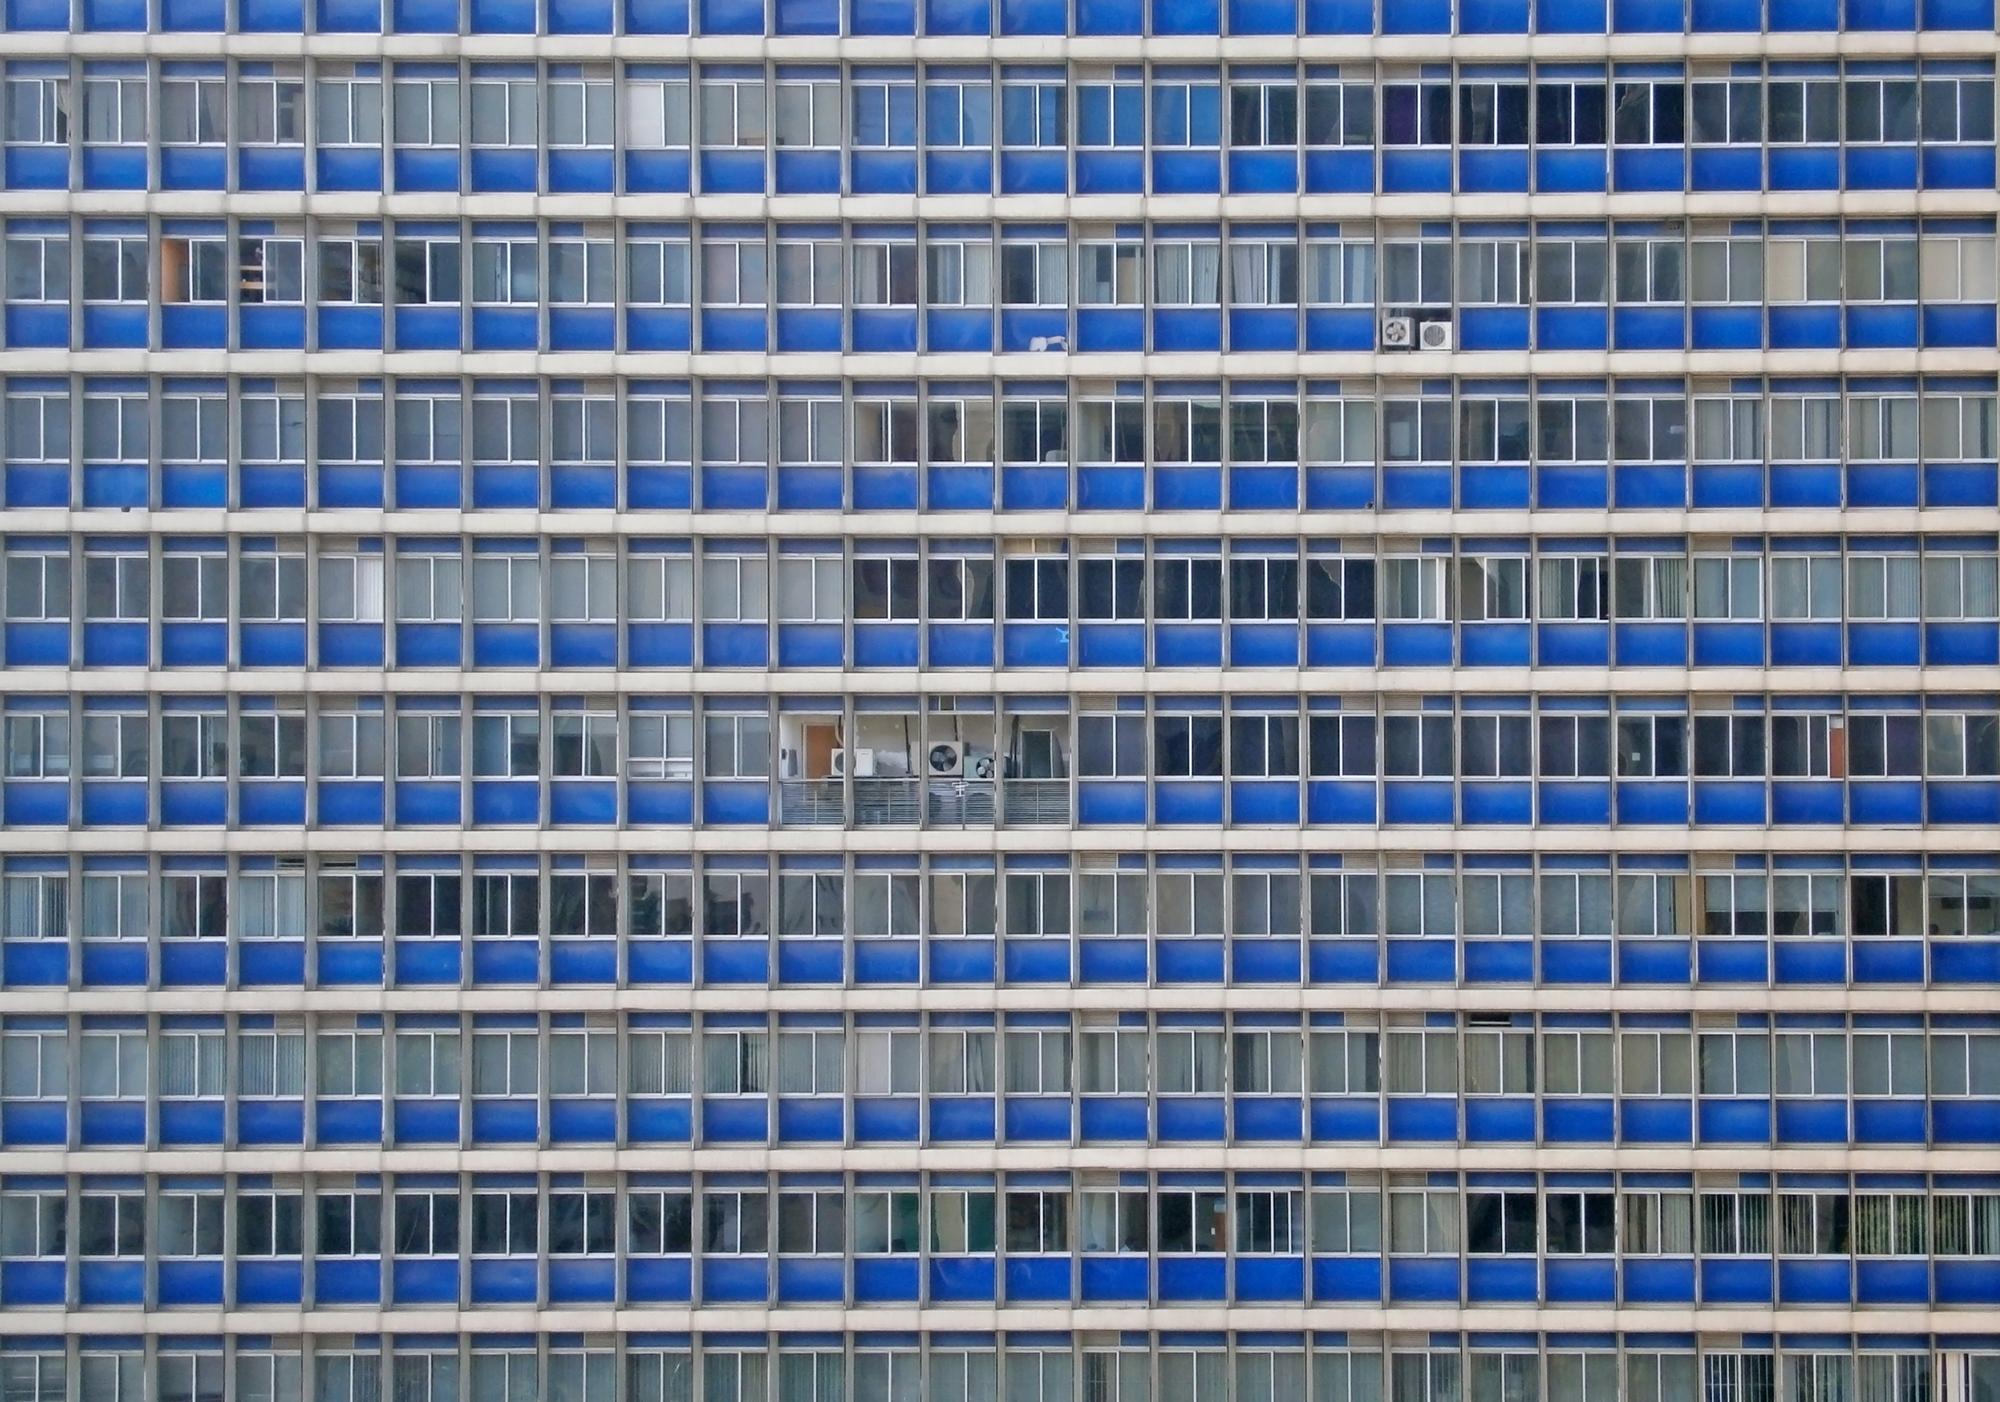 Building A Windows  Home Server Ebook Download